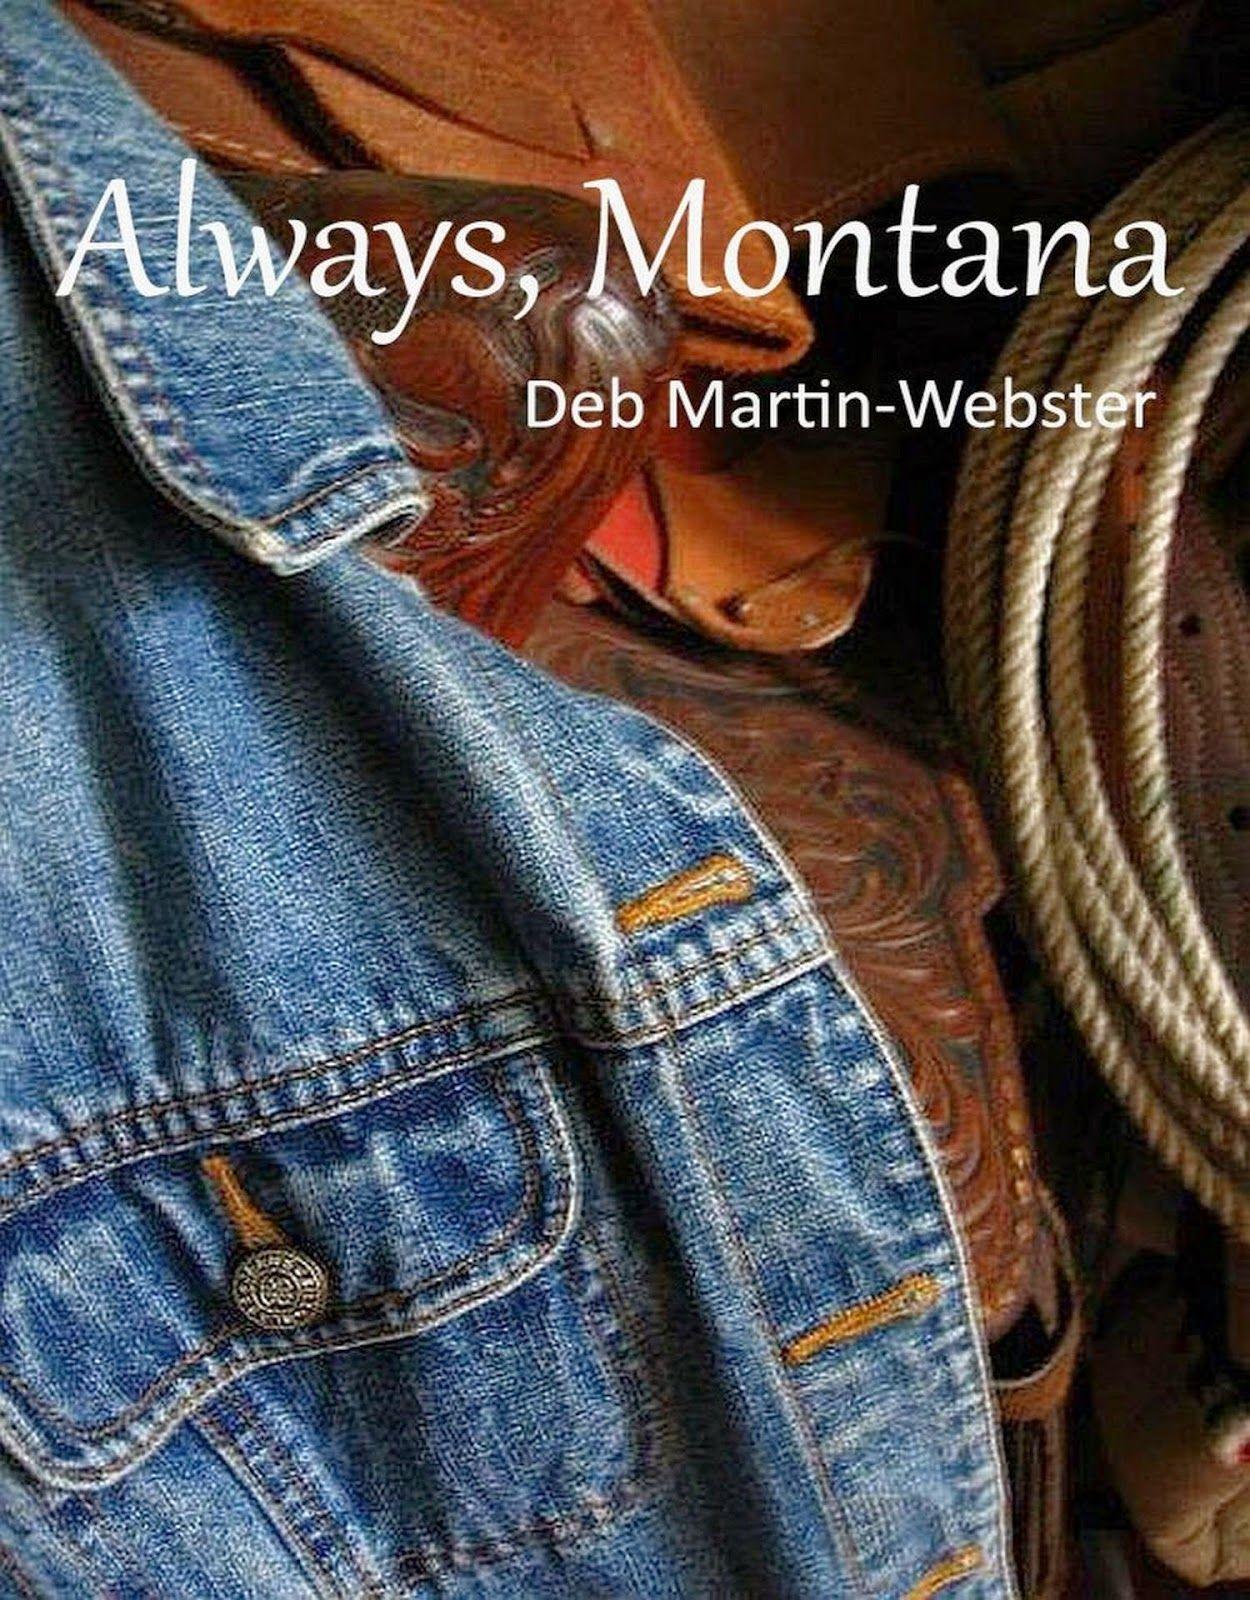 M.E. Franco Blog Spot post for Deb Martin-Websters newest novel, Always, Montana.